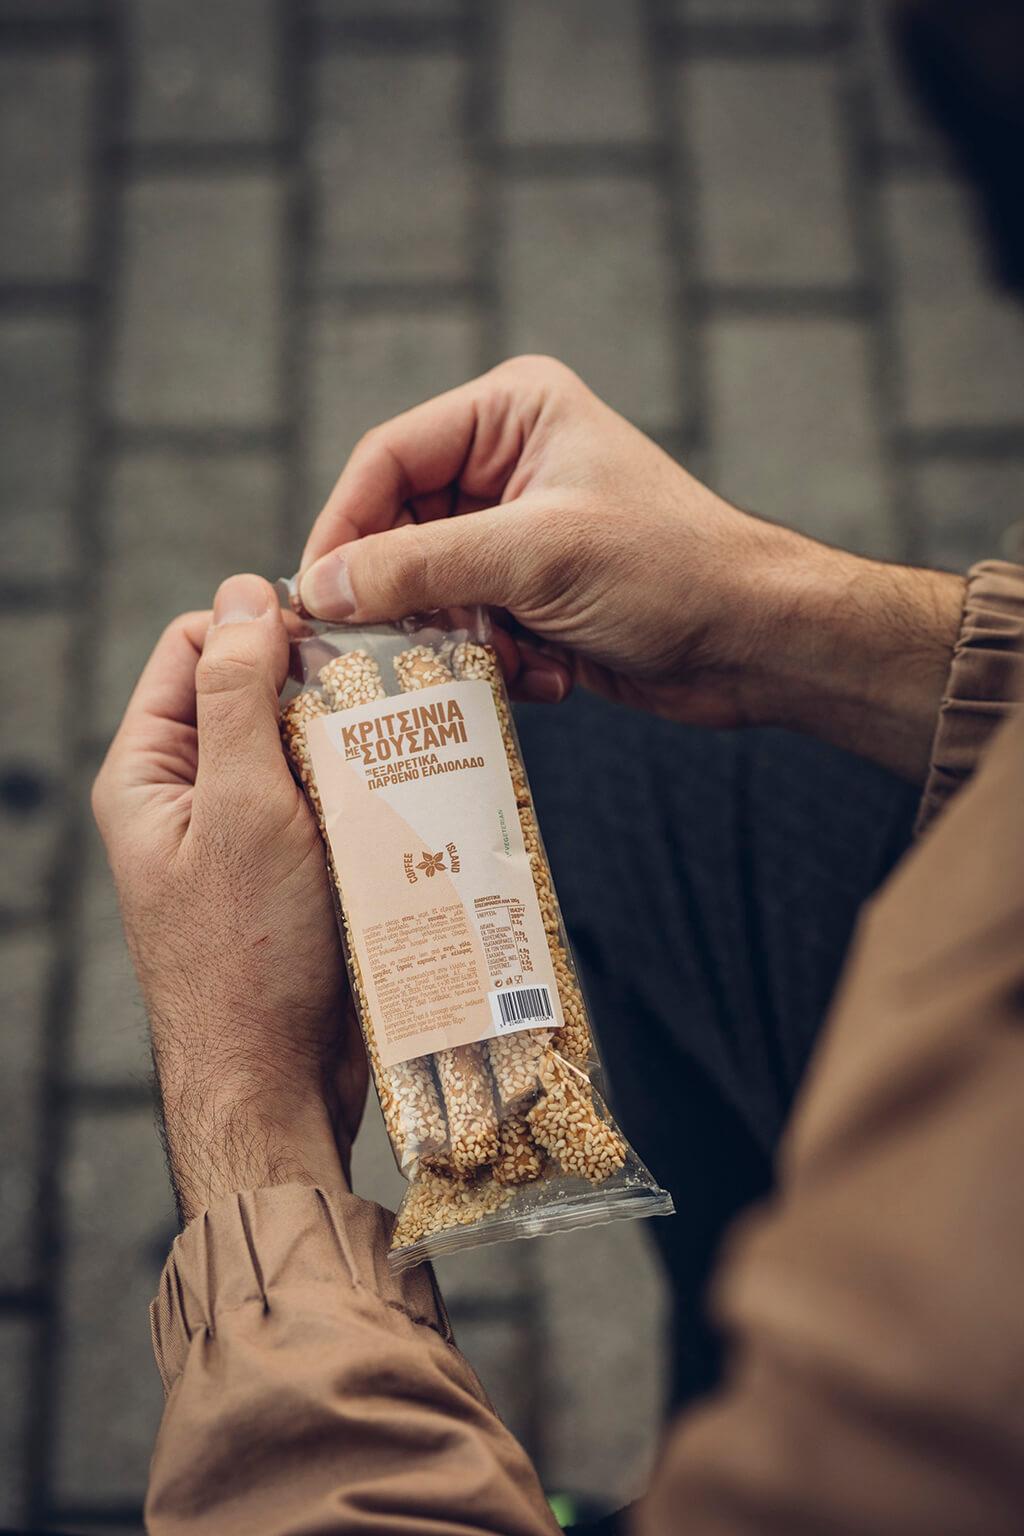 Coffee Island's new breadsticks with sesami seads.